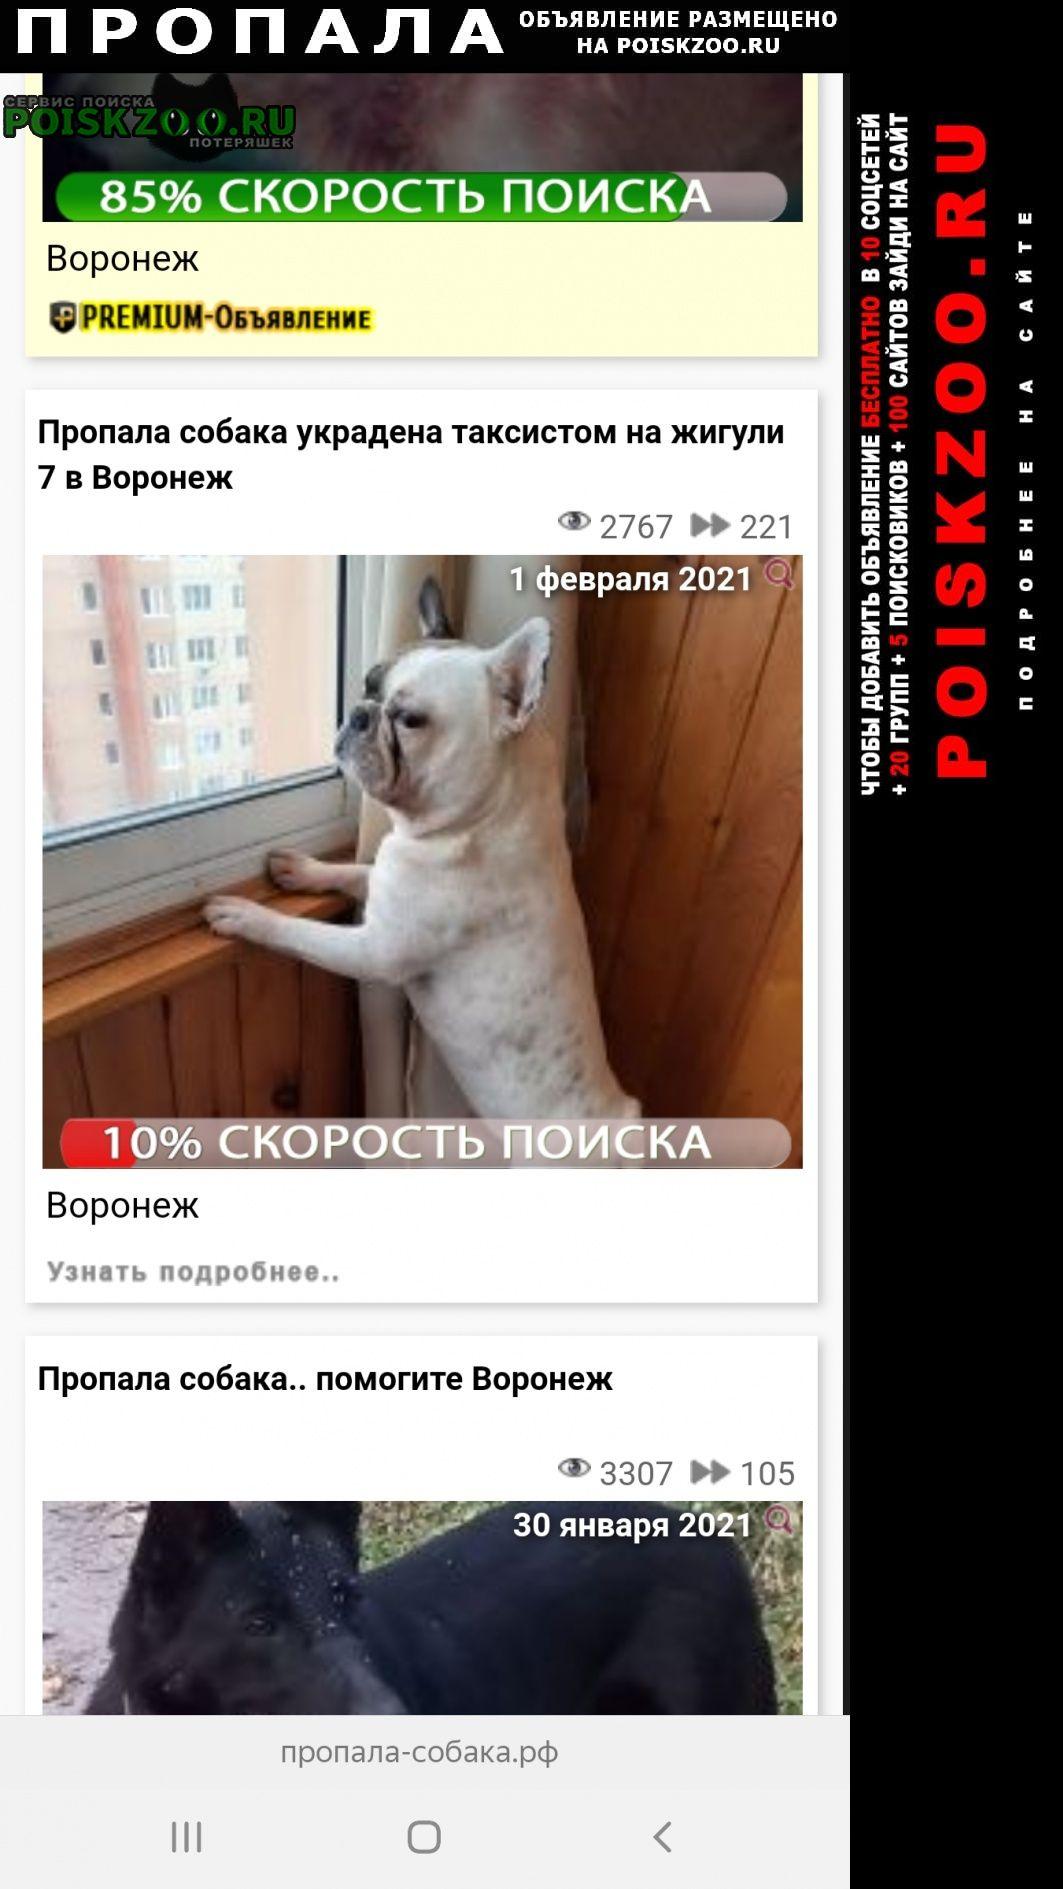 Пропала собака украден французкий бульдог Воронеж